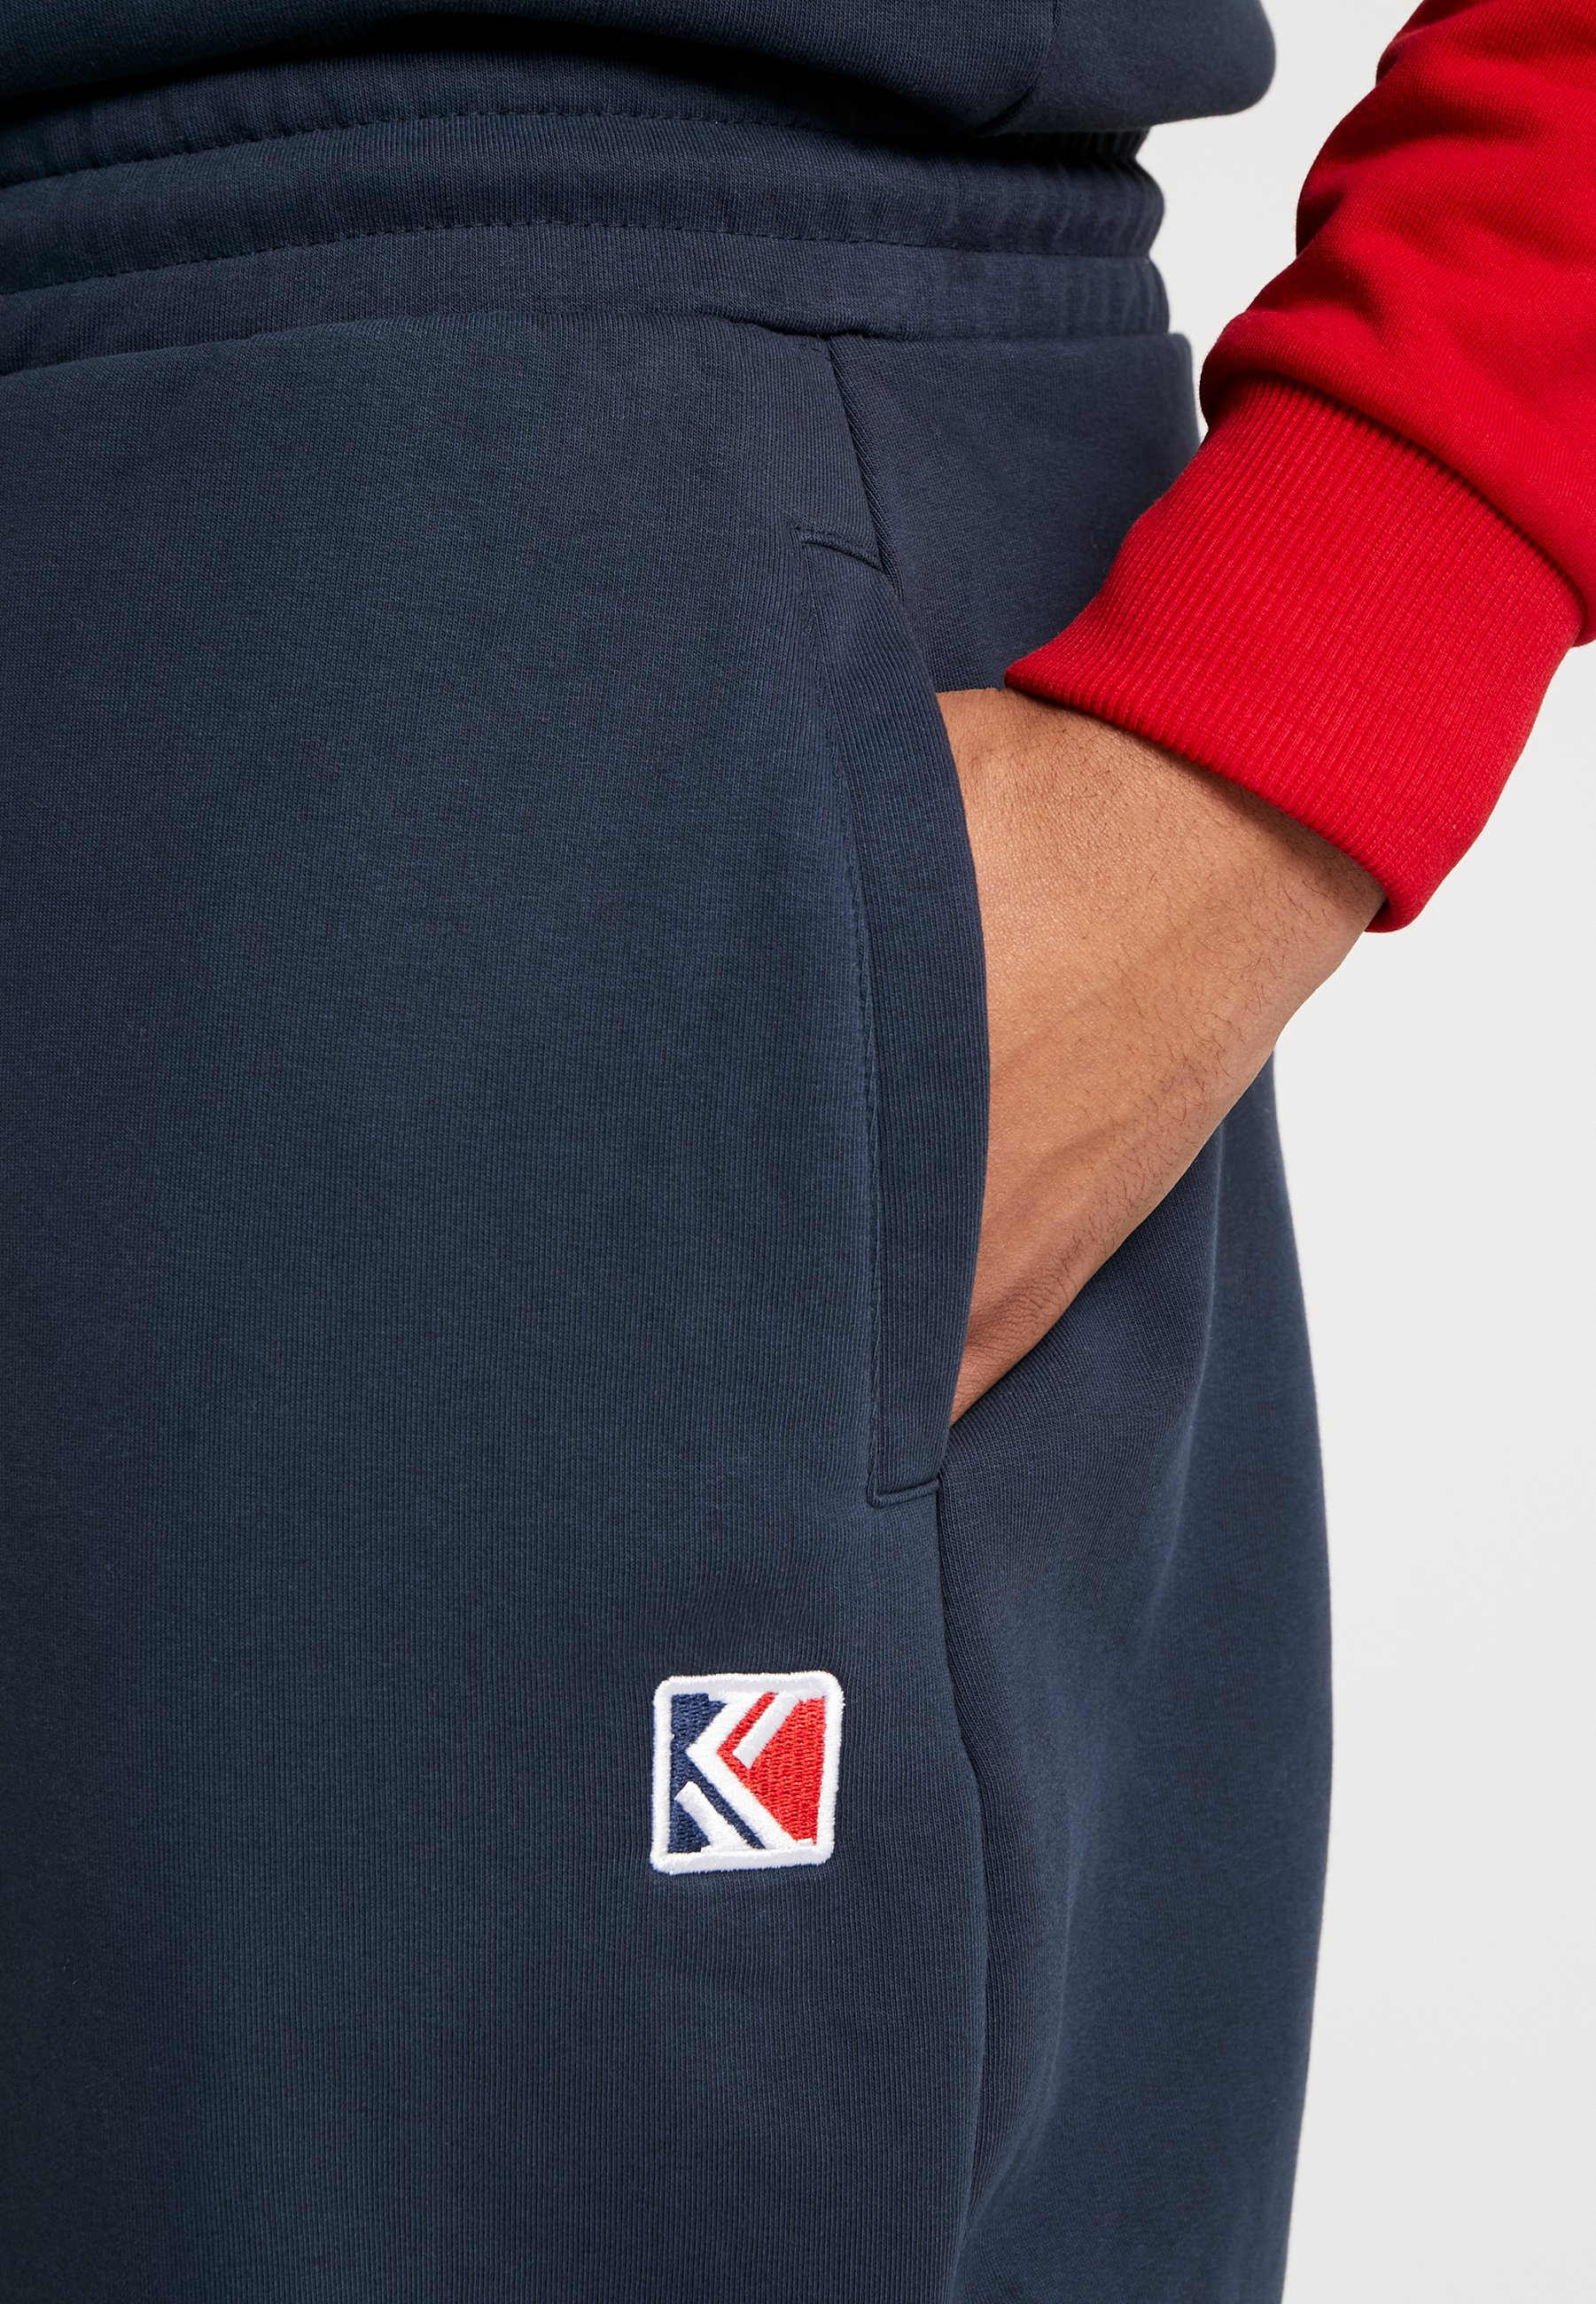 Karl Kani Retro Trackpants - Träningsbyxor Navy